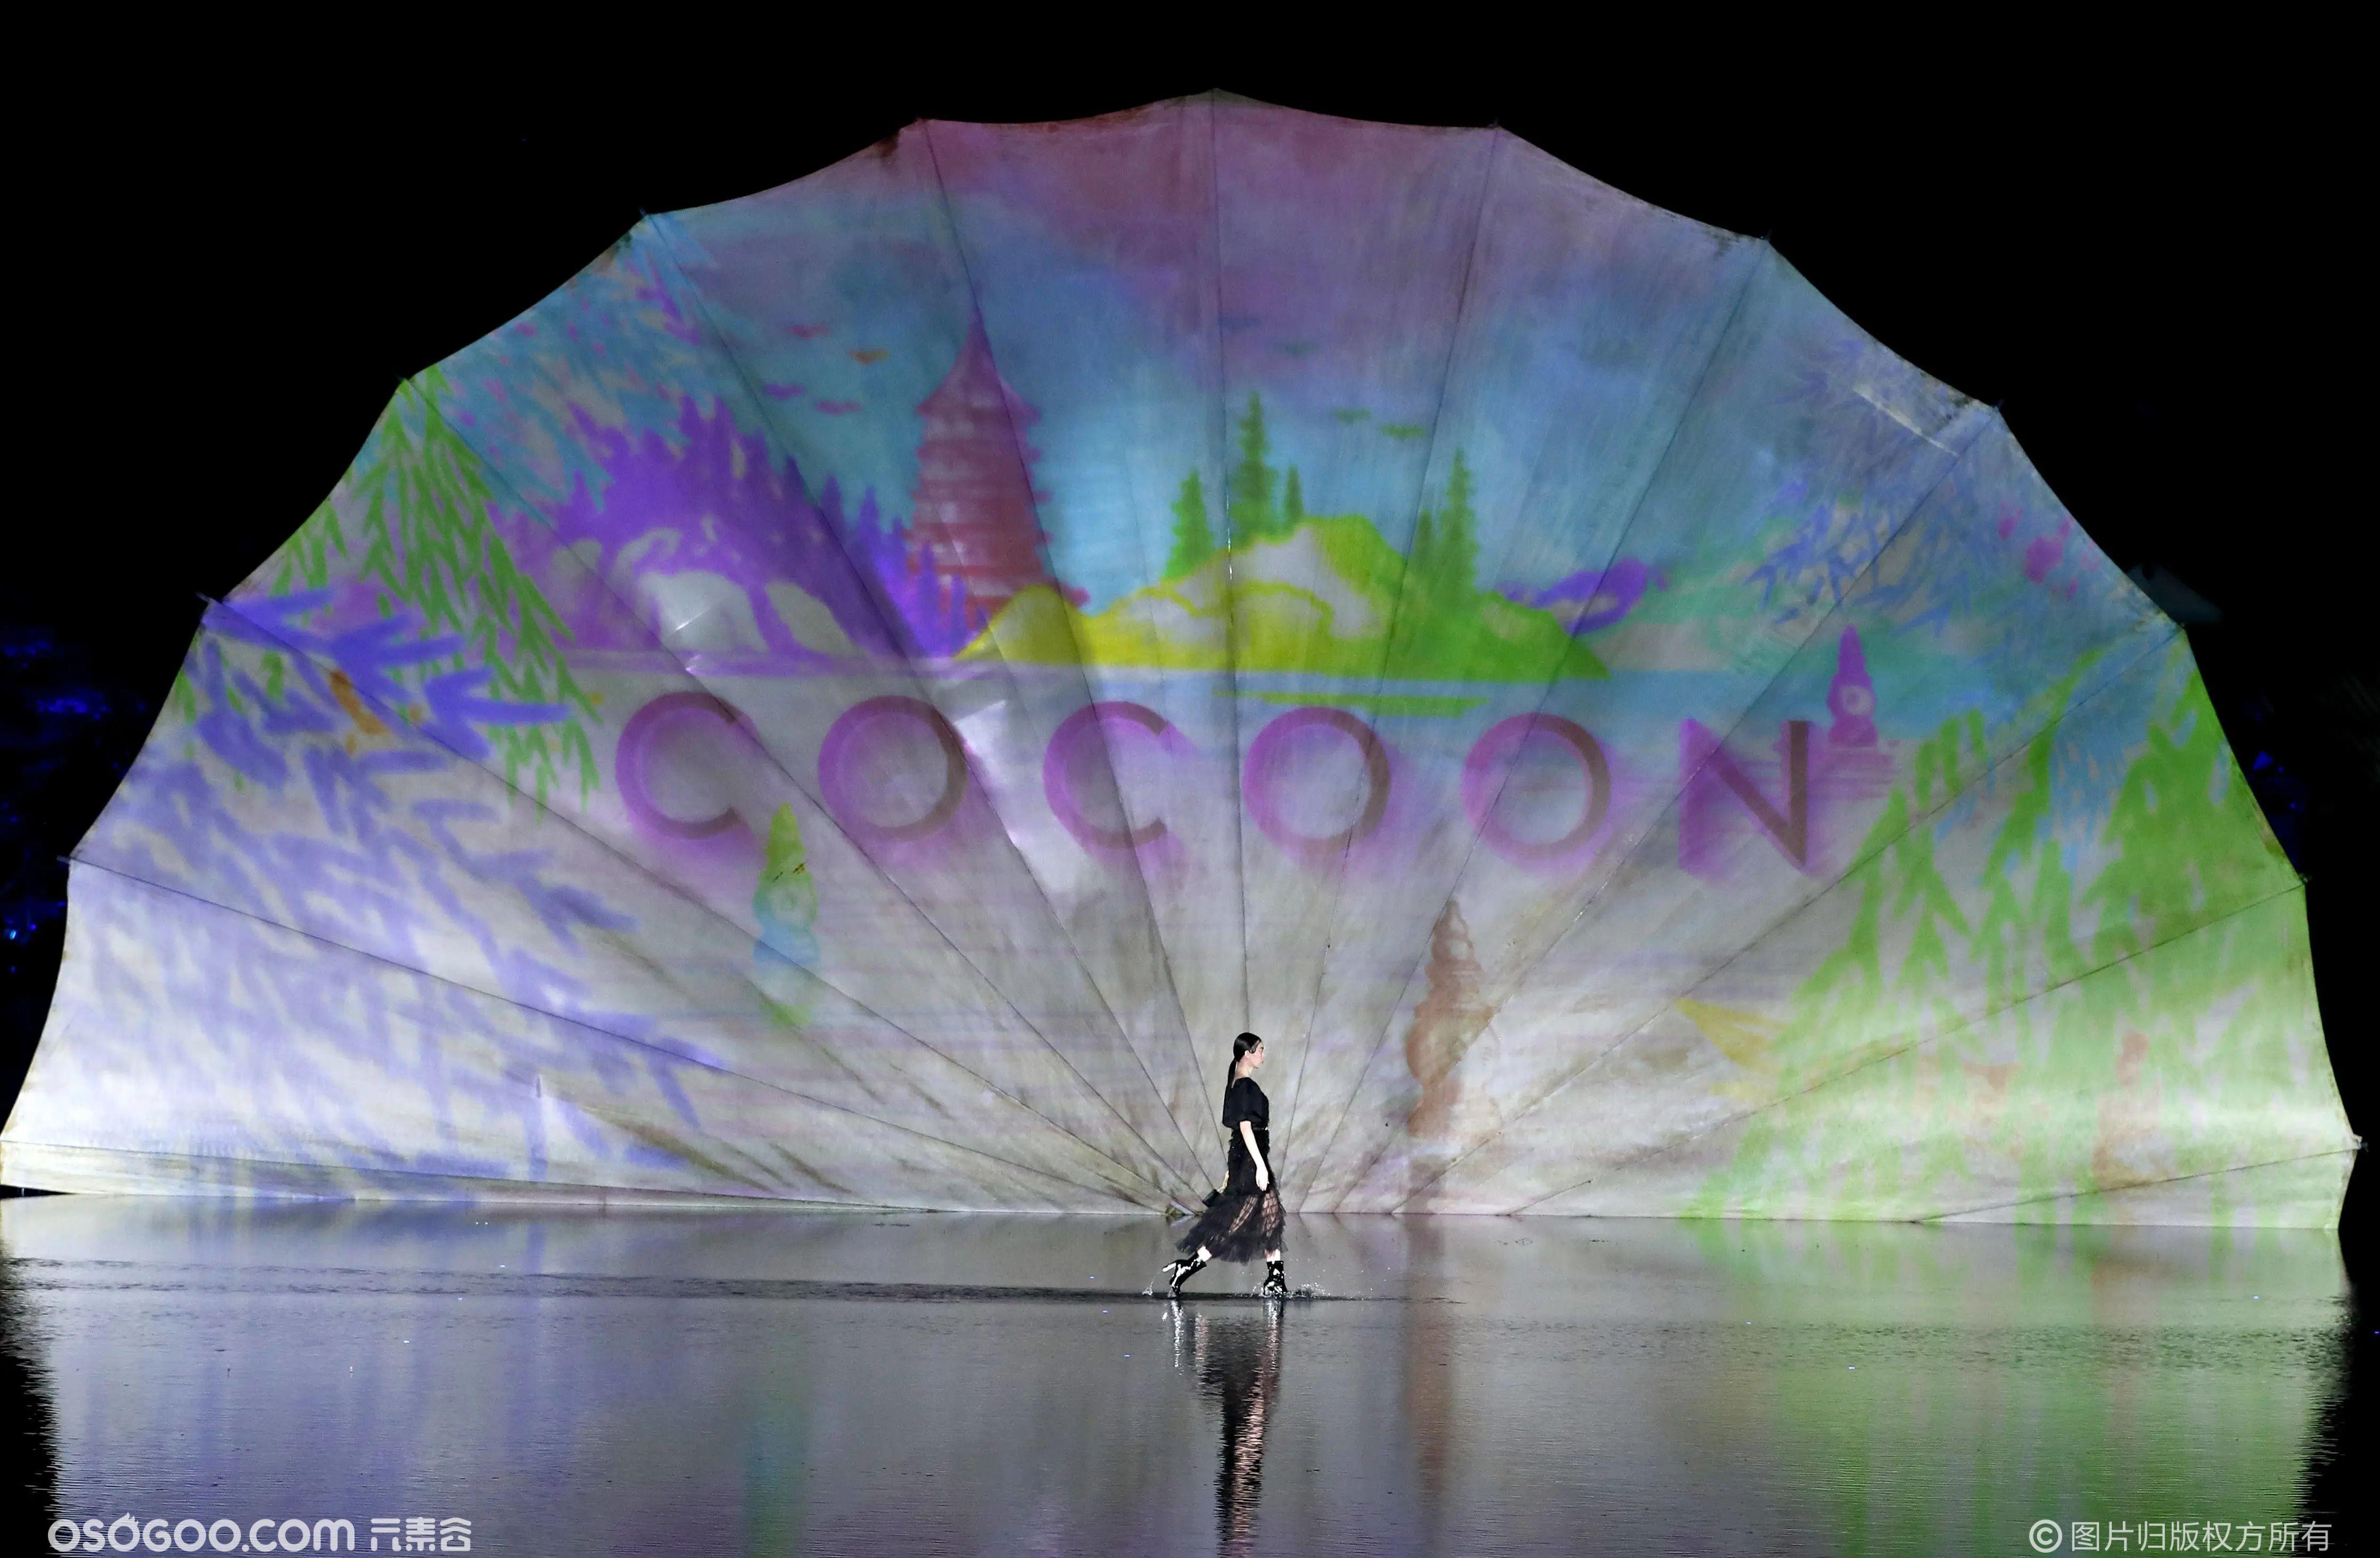 COCOON可可尼 2021秋冬时装发布大秀